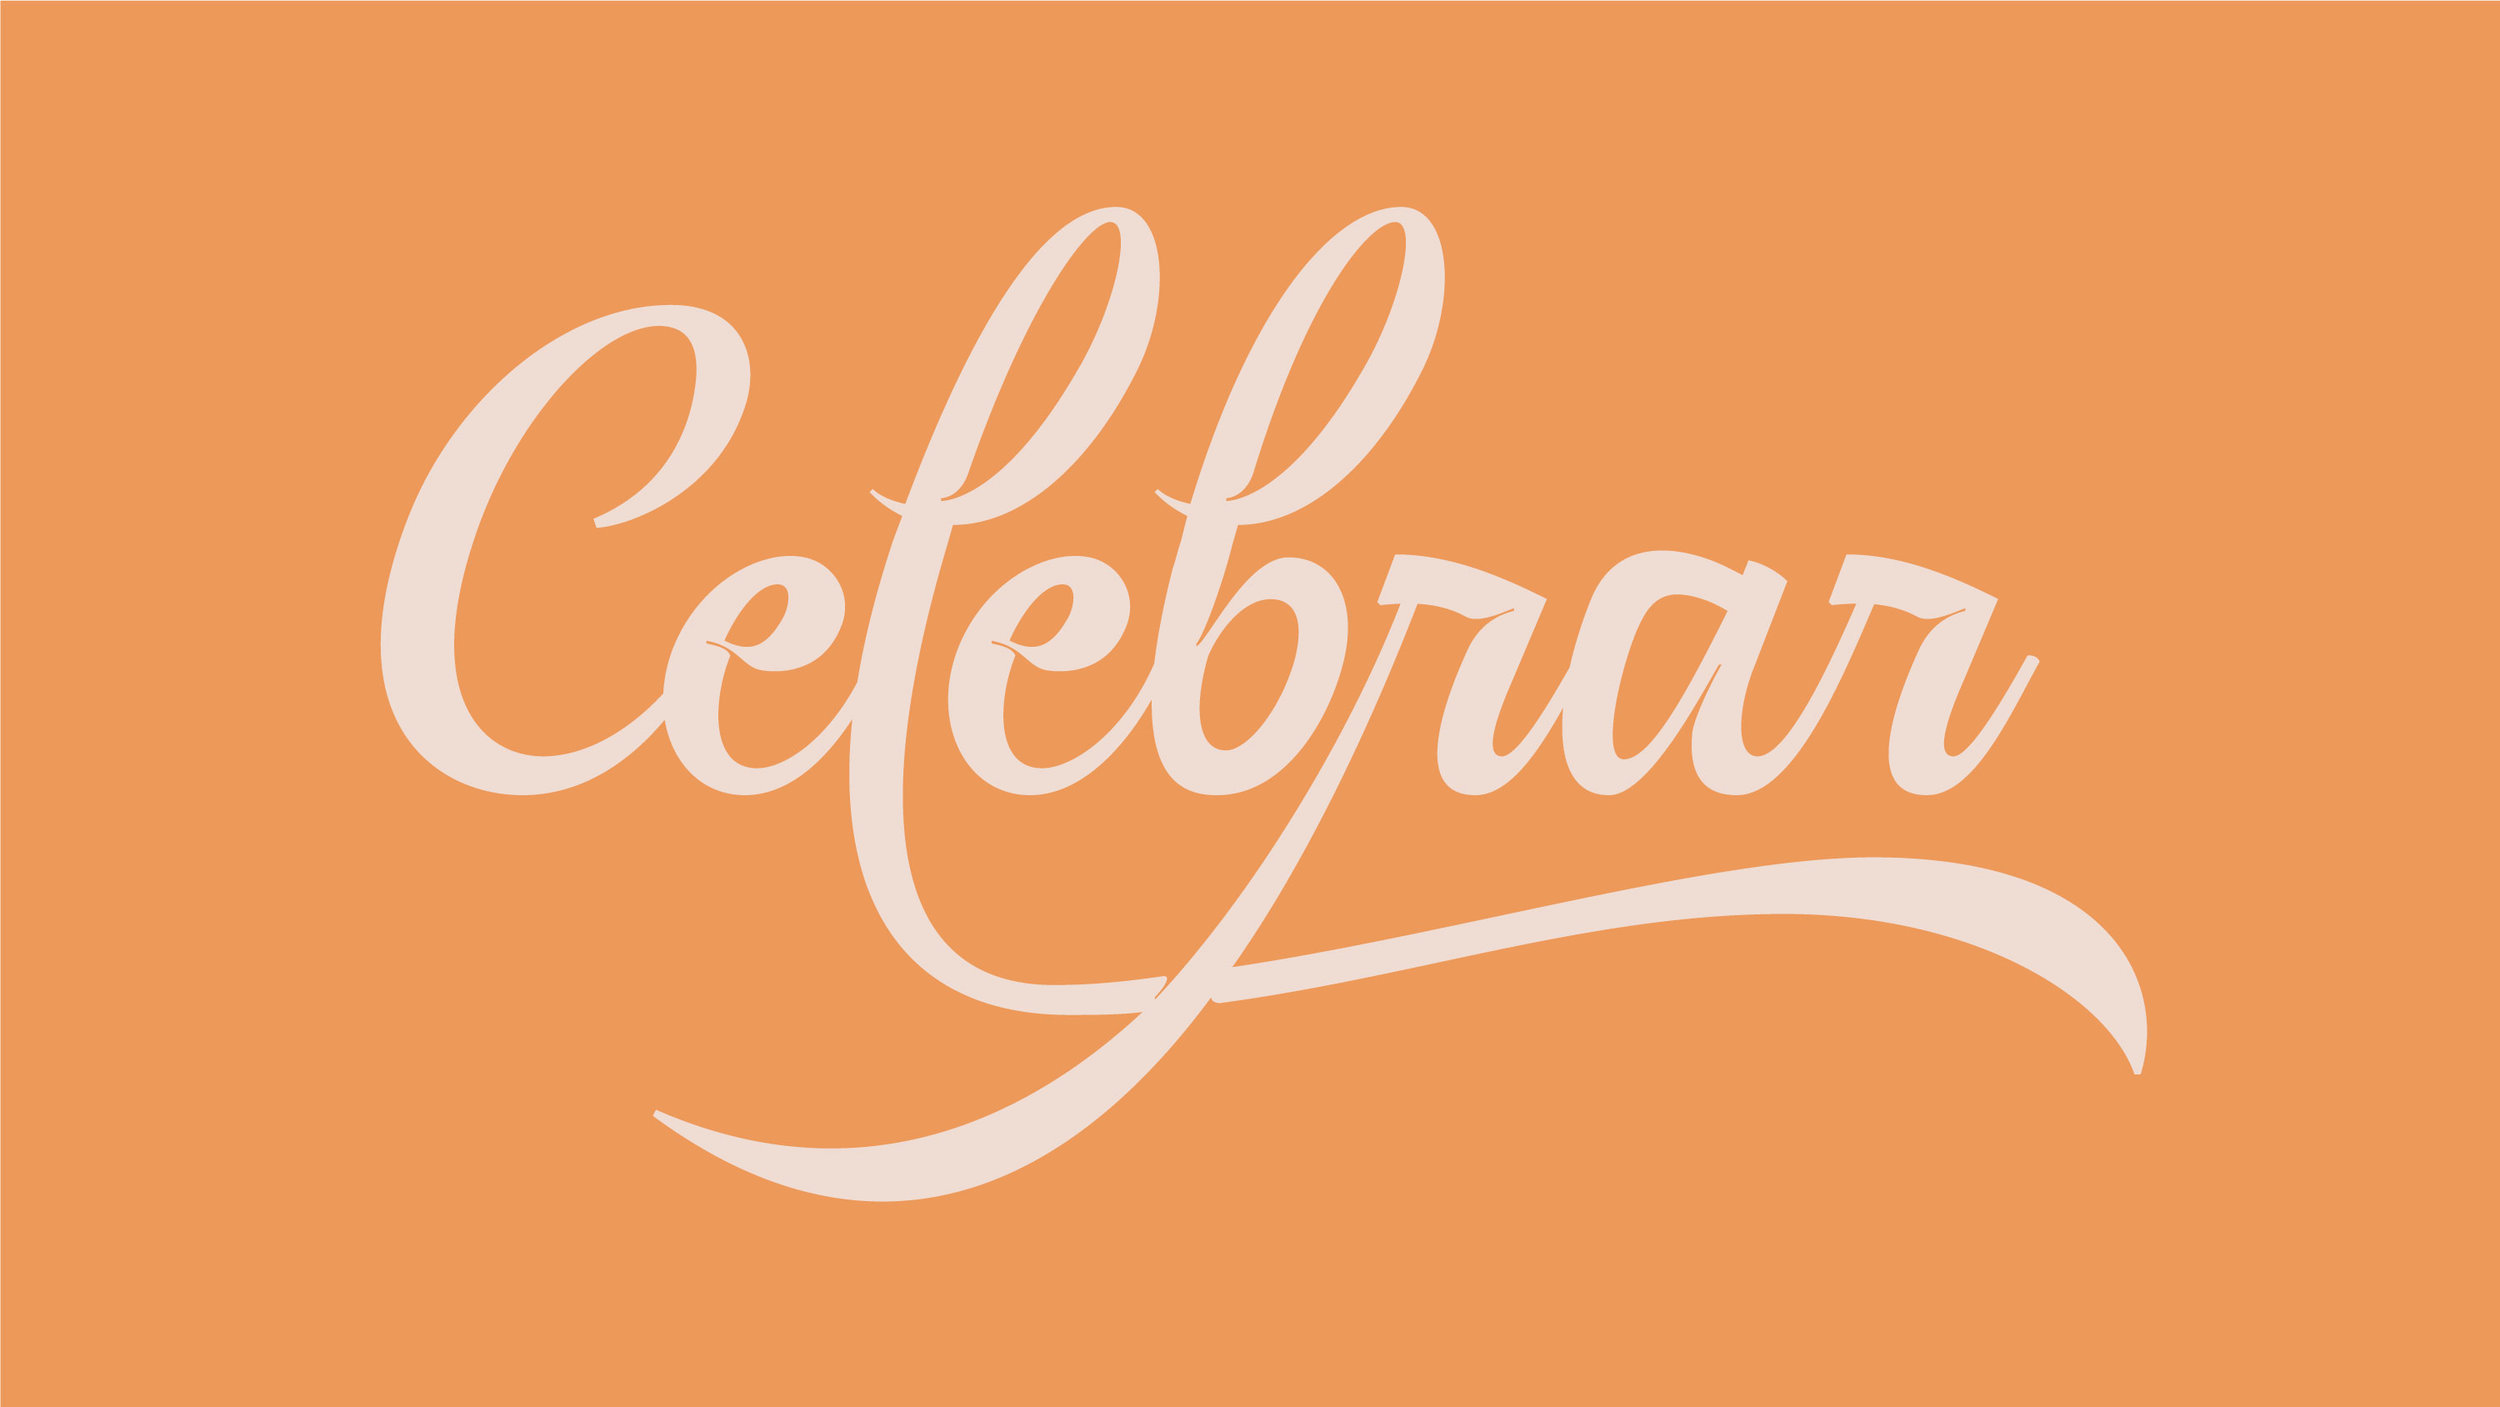 Celebrar_Logo_Final.jpg